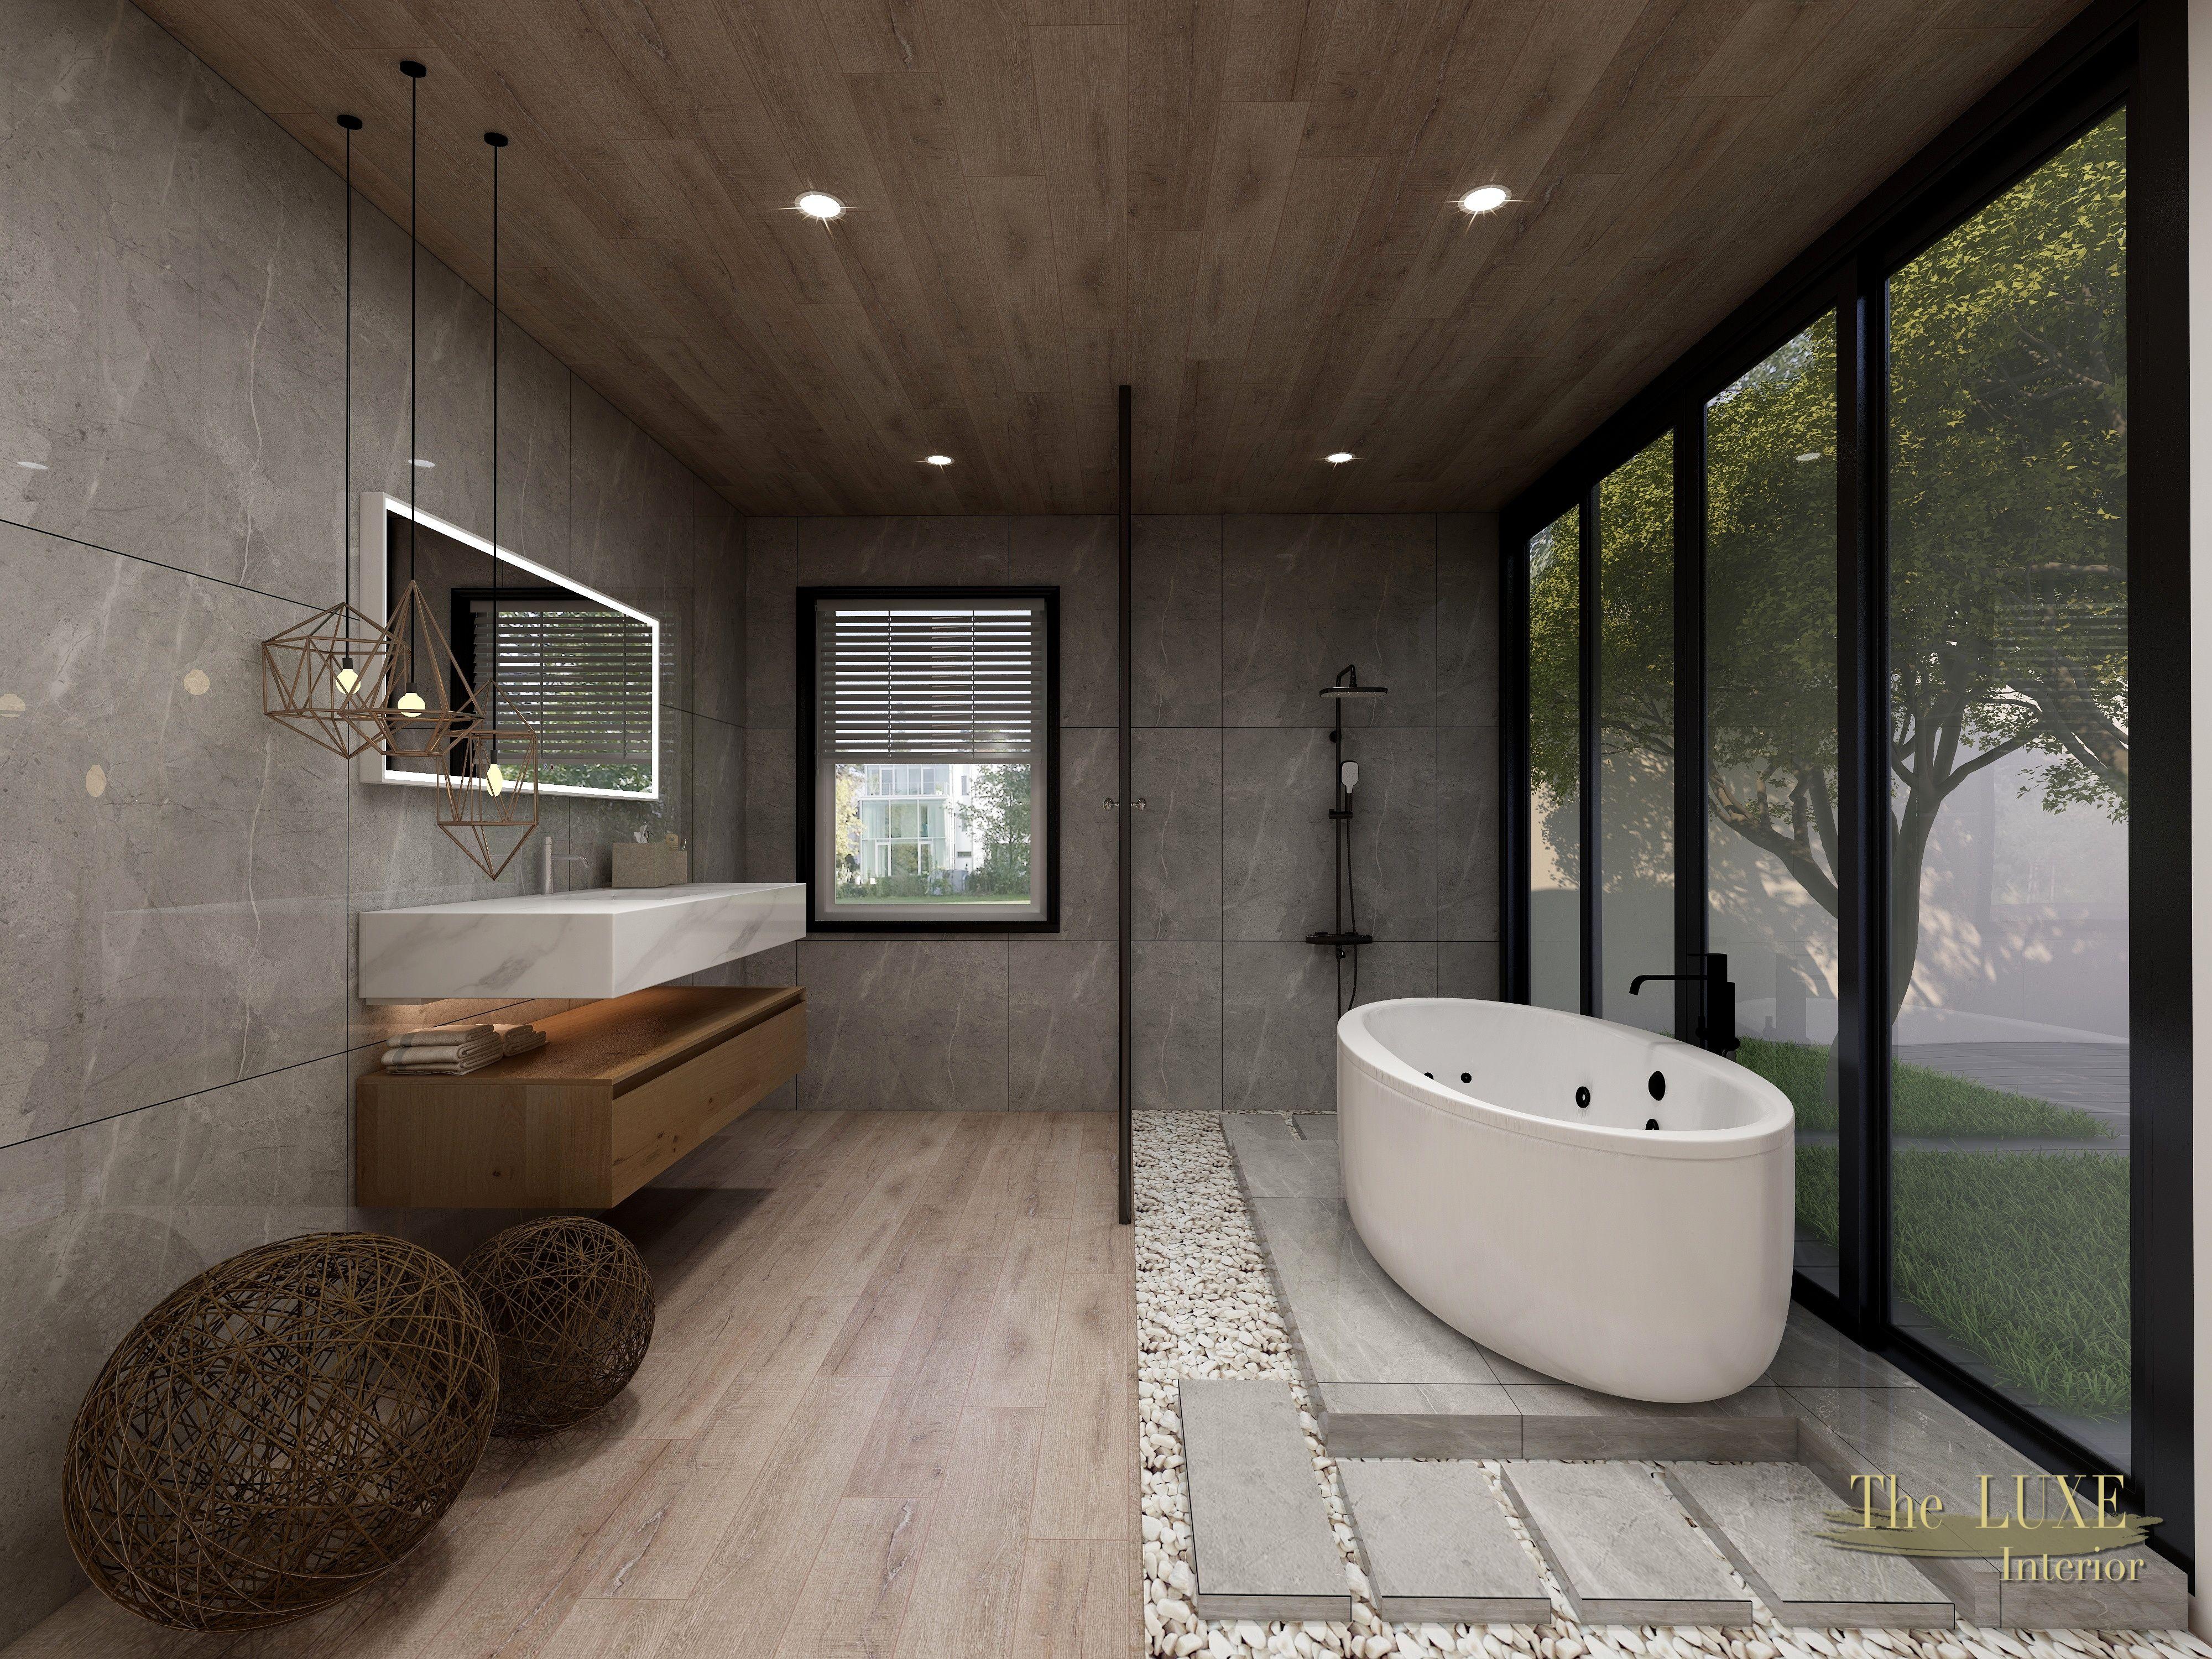 Modern Bathroom Interior Design Interior Design Consultation Bathroom Interior Design Modern Bathroom Interior Modern bathroom interior decorating